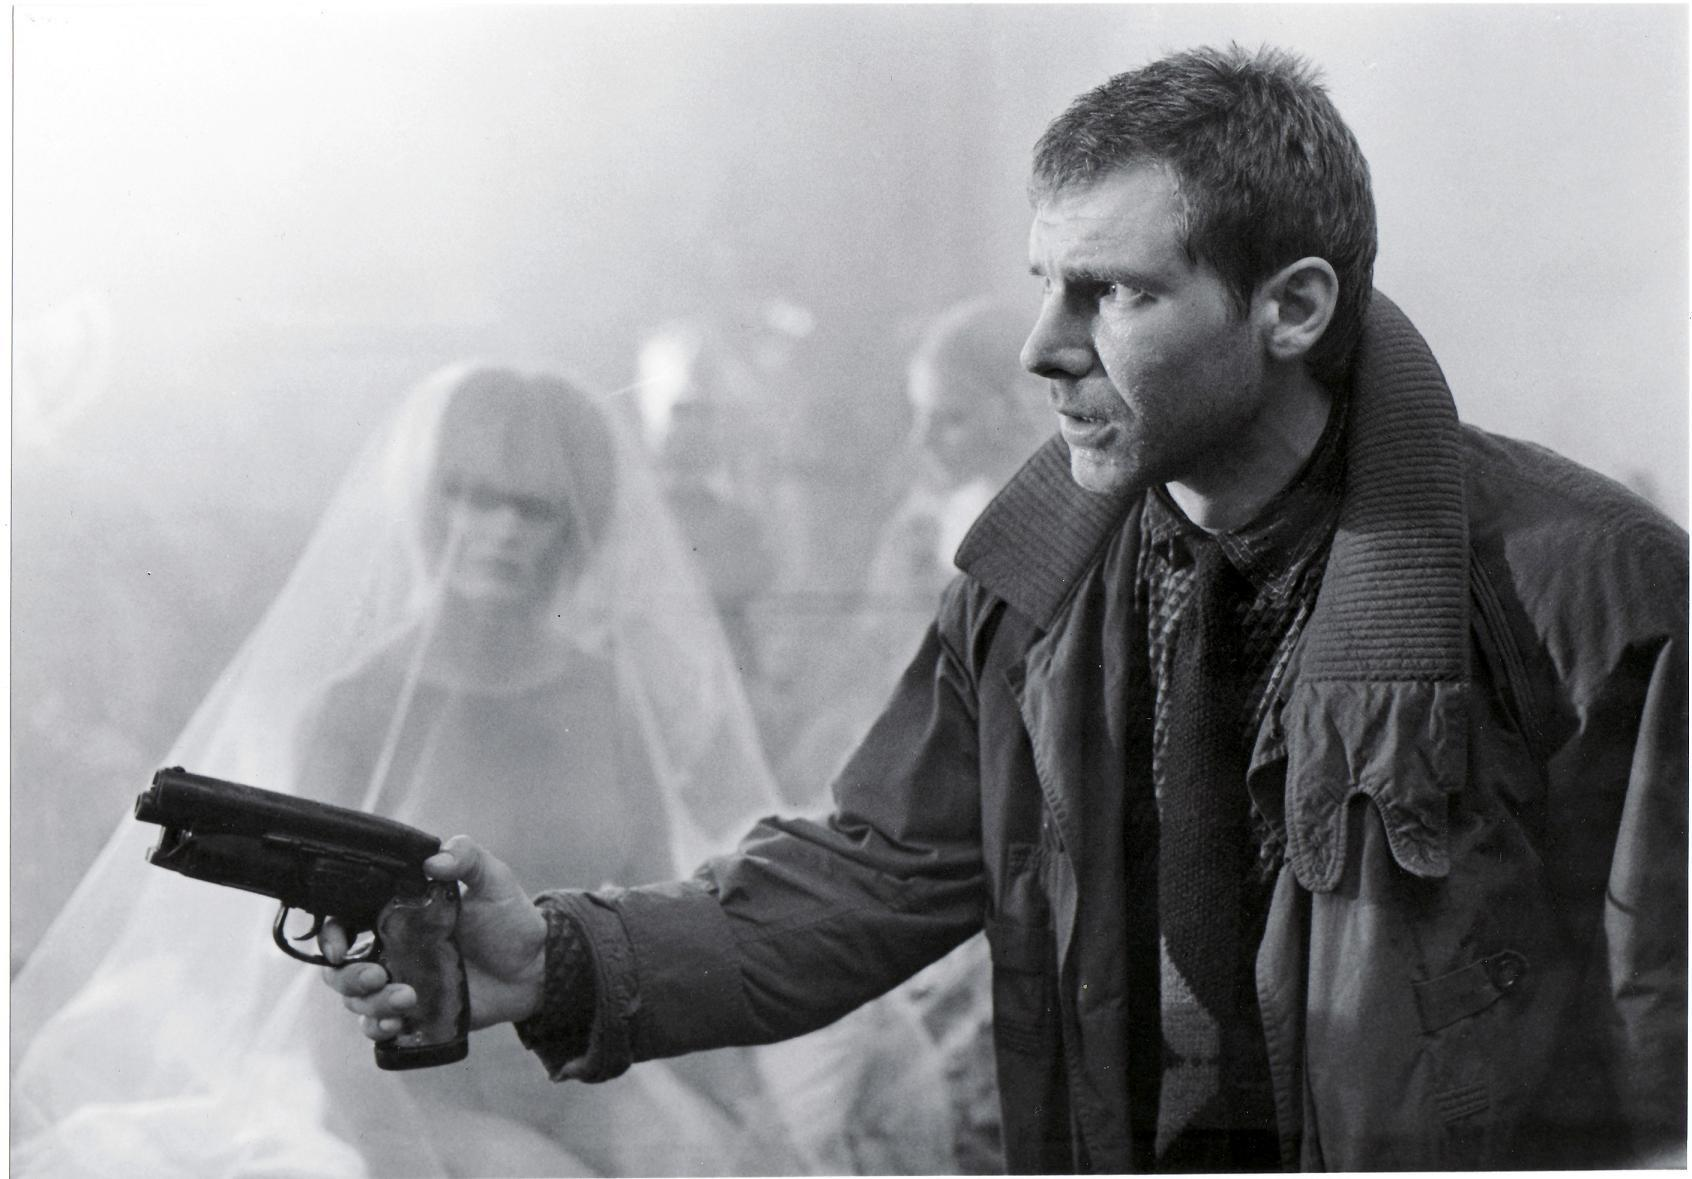 Harrison-Ford-as-Deckard-in-Bladerunner-blade-runner-8242635-1692-1179.jpg